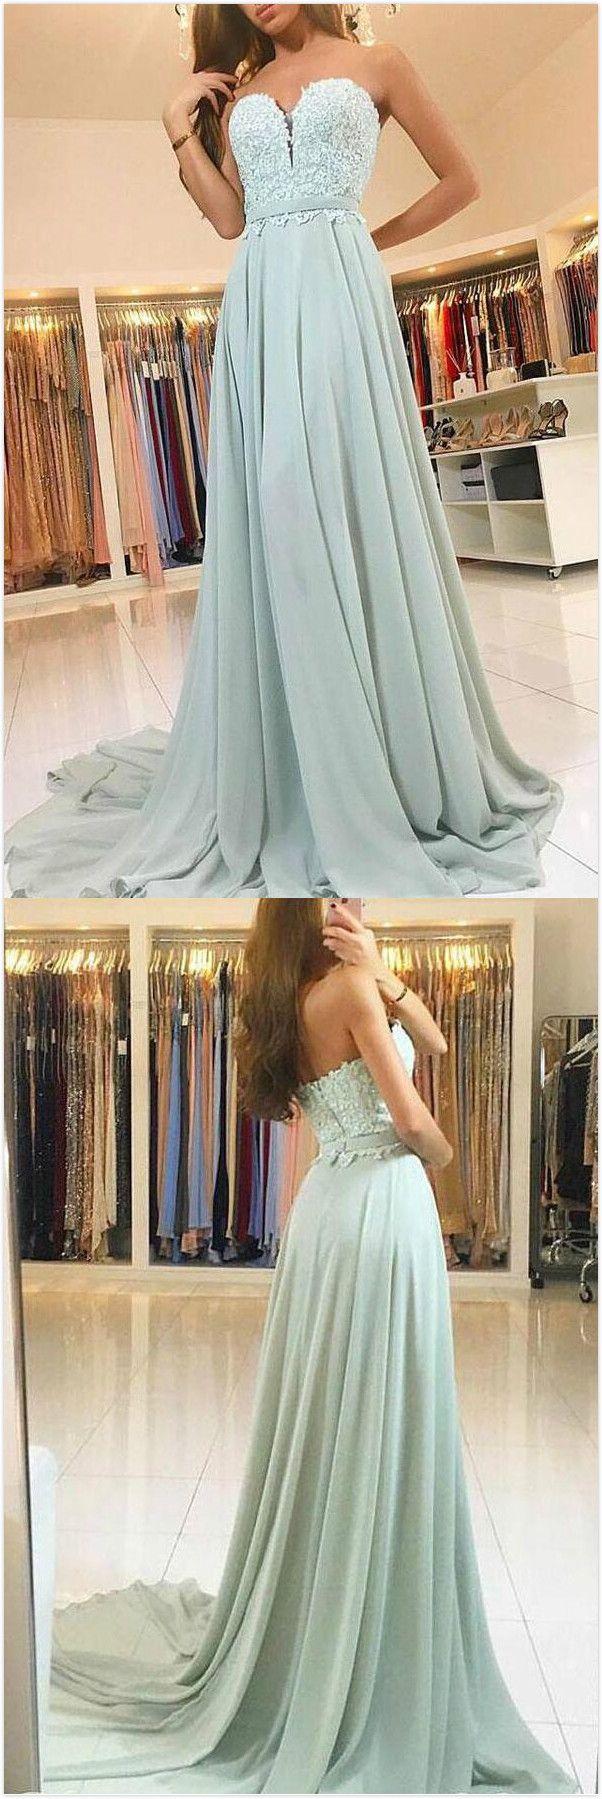 Glamorous Prom Dress,A-Line Sweetheart Prom Dress,Chiffon Prom Dress ...